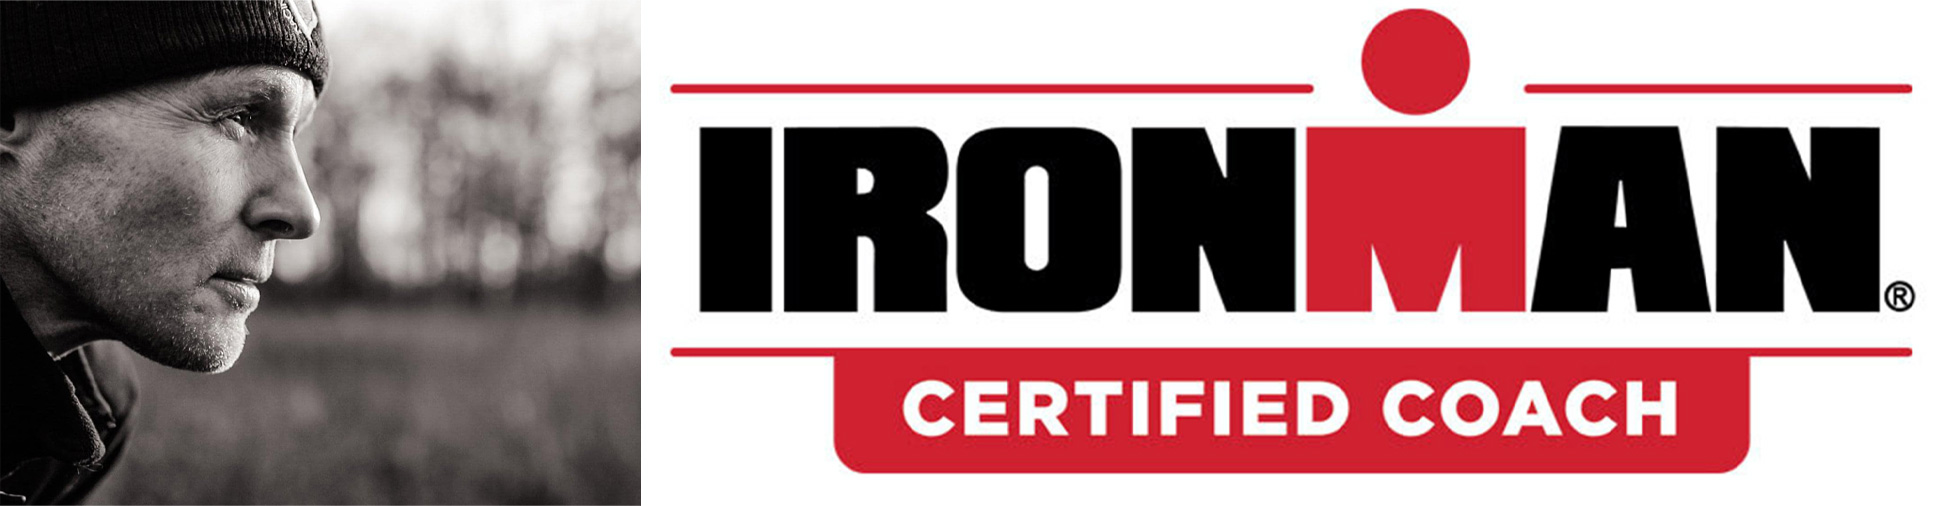 Todd Crandell, Certified Ironman Coach